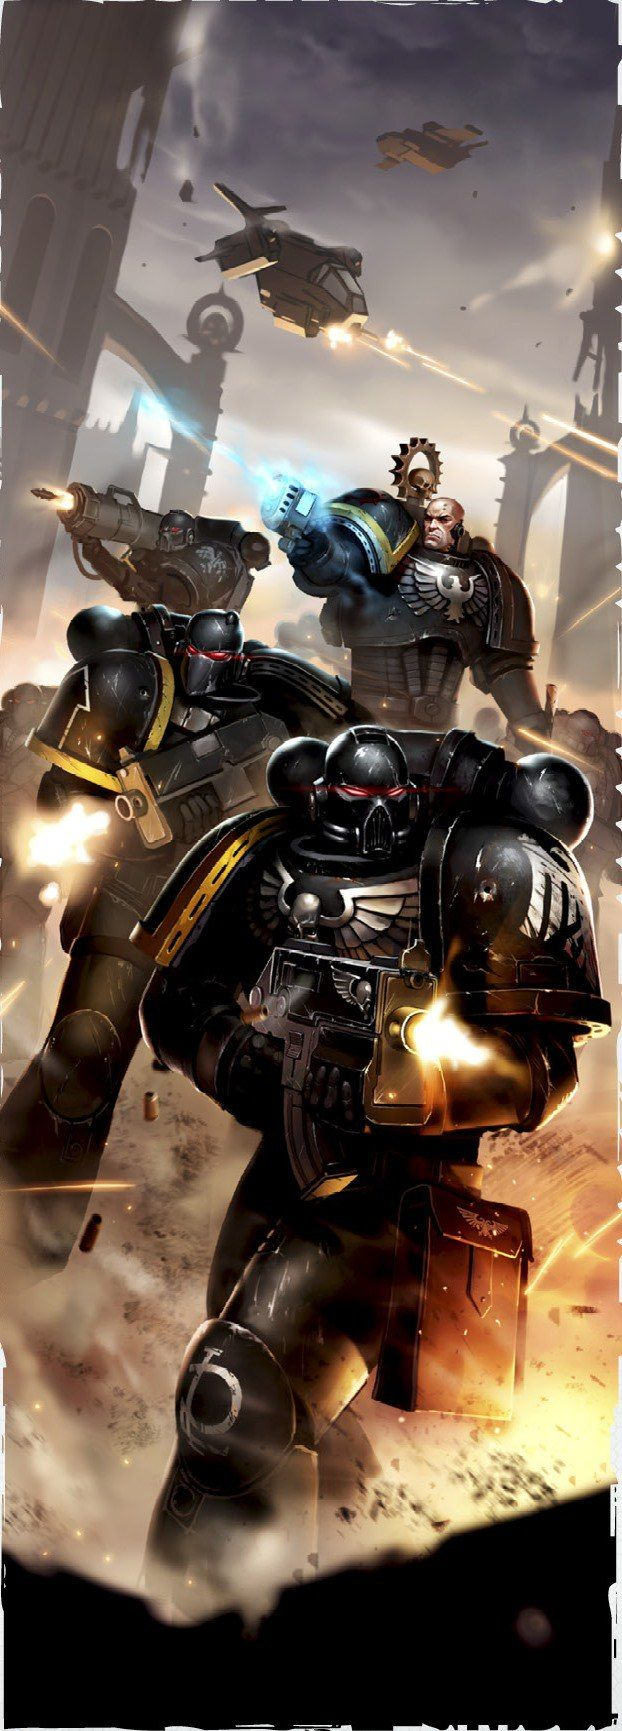 Warhammer 40000,warhammer40000, warhammer40k, warhammer 40k, ваха, сорокотысячник,Wh Песочница,фэндомы,Imperium,Империум,Space Marine,Adeptus Astartes,Raven Guard,Imperial Knight,House Terryn,Knight Paladin,Freeblades,Obsidian Knight,Kayvaan Shrike,Tau Empire,Tau, Тау,XV104 Riptide